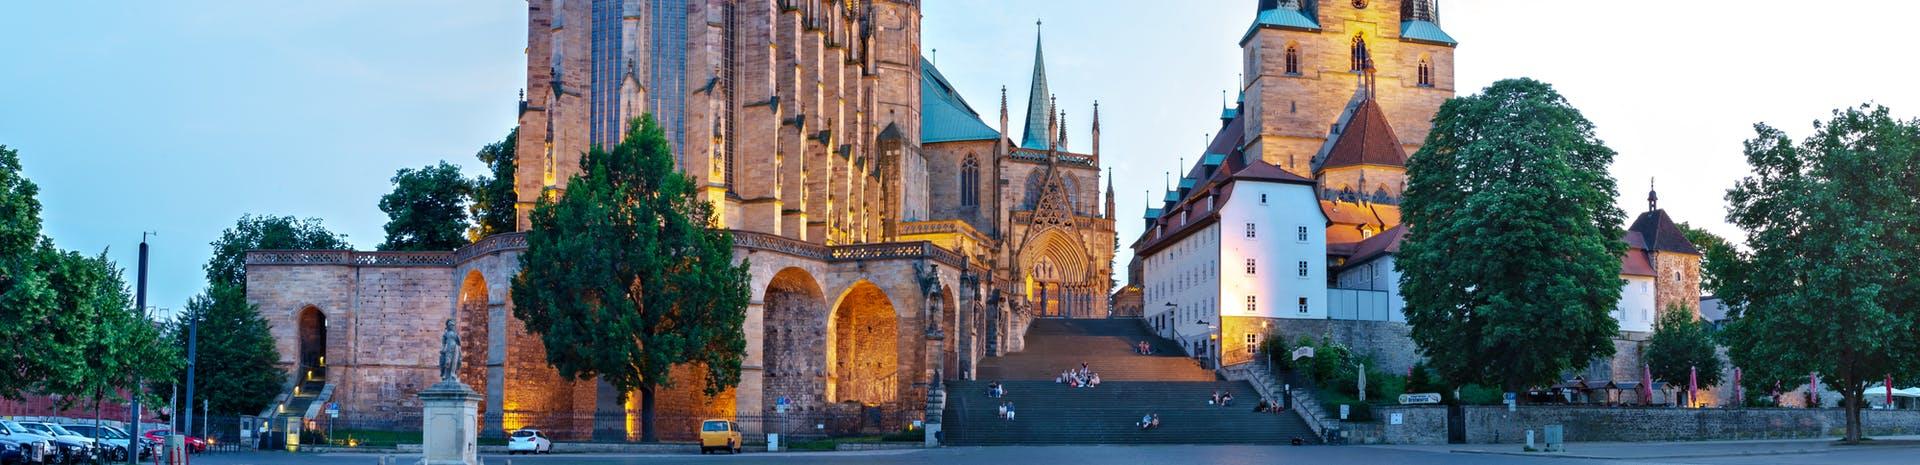 Picture of Erfurt